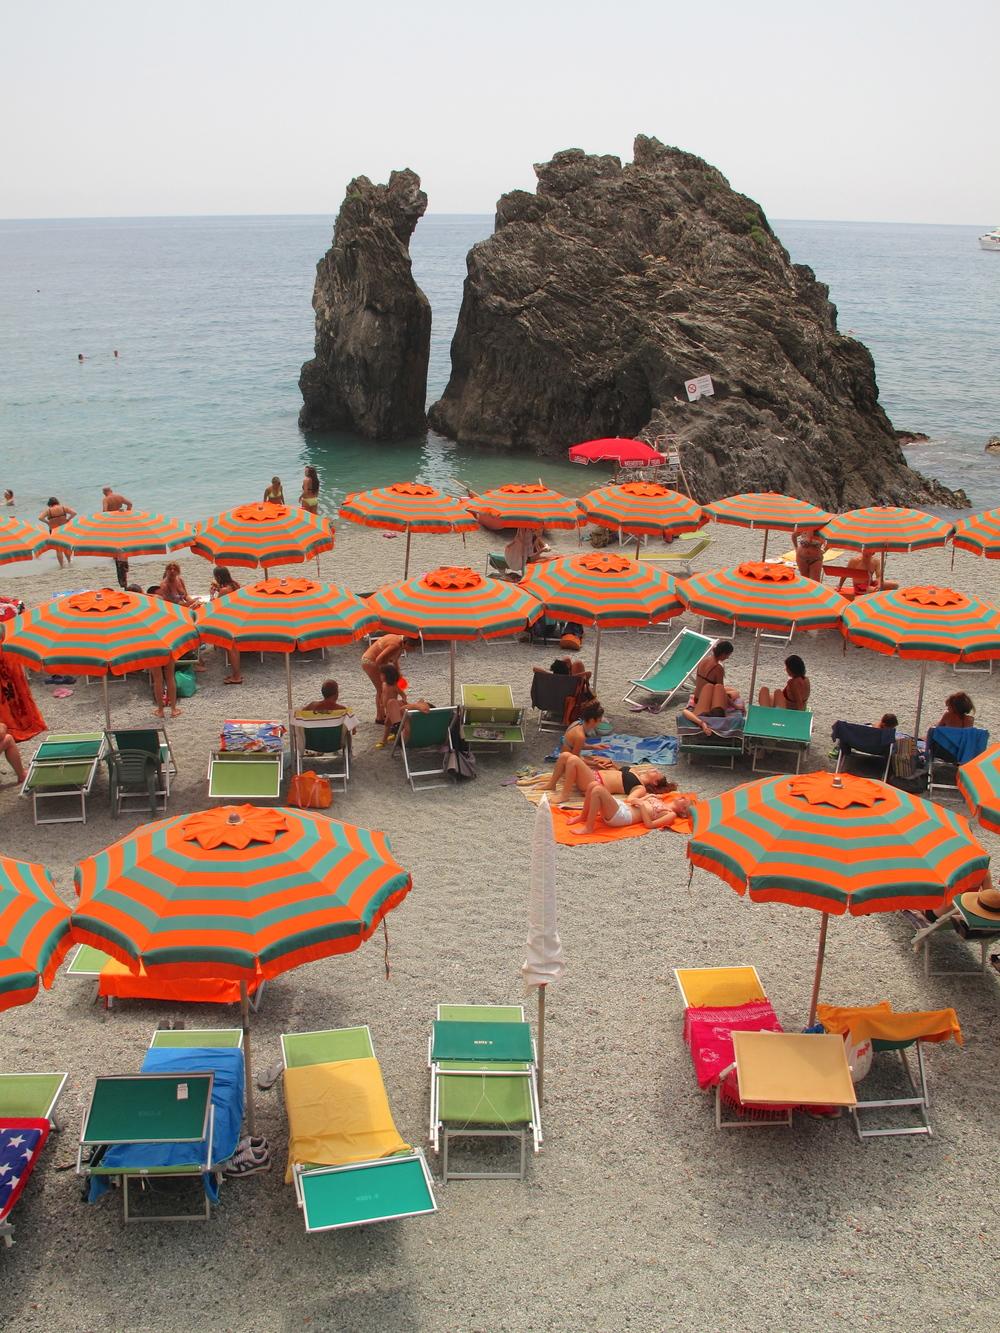 Striped orange and green sun umbrellas on the beaches of the Cinque Terre